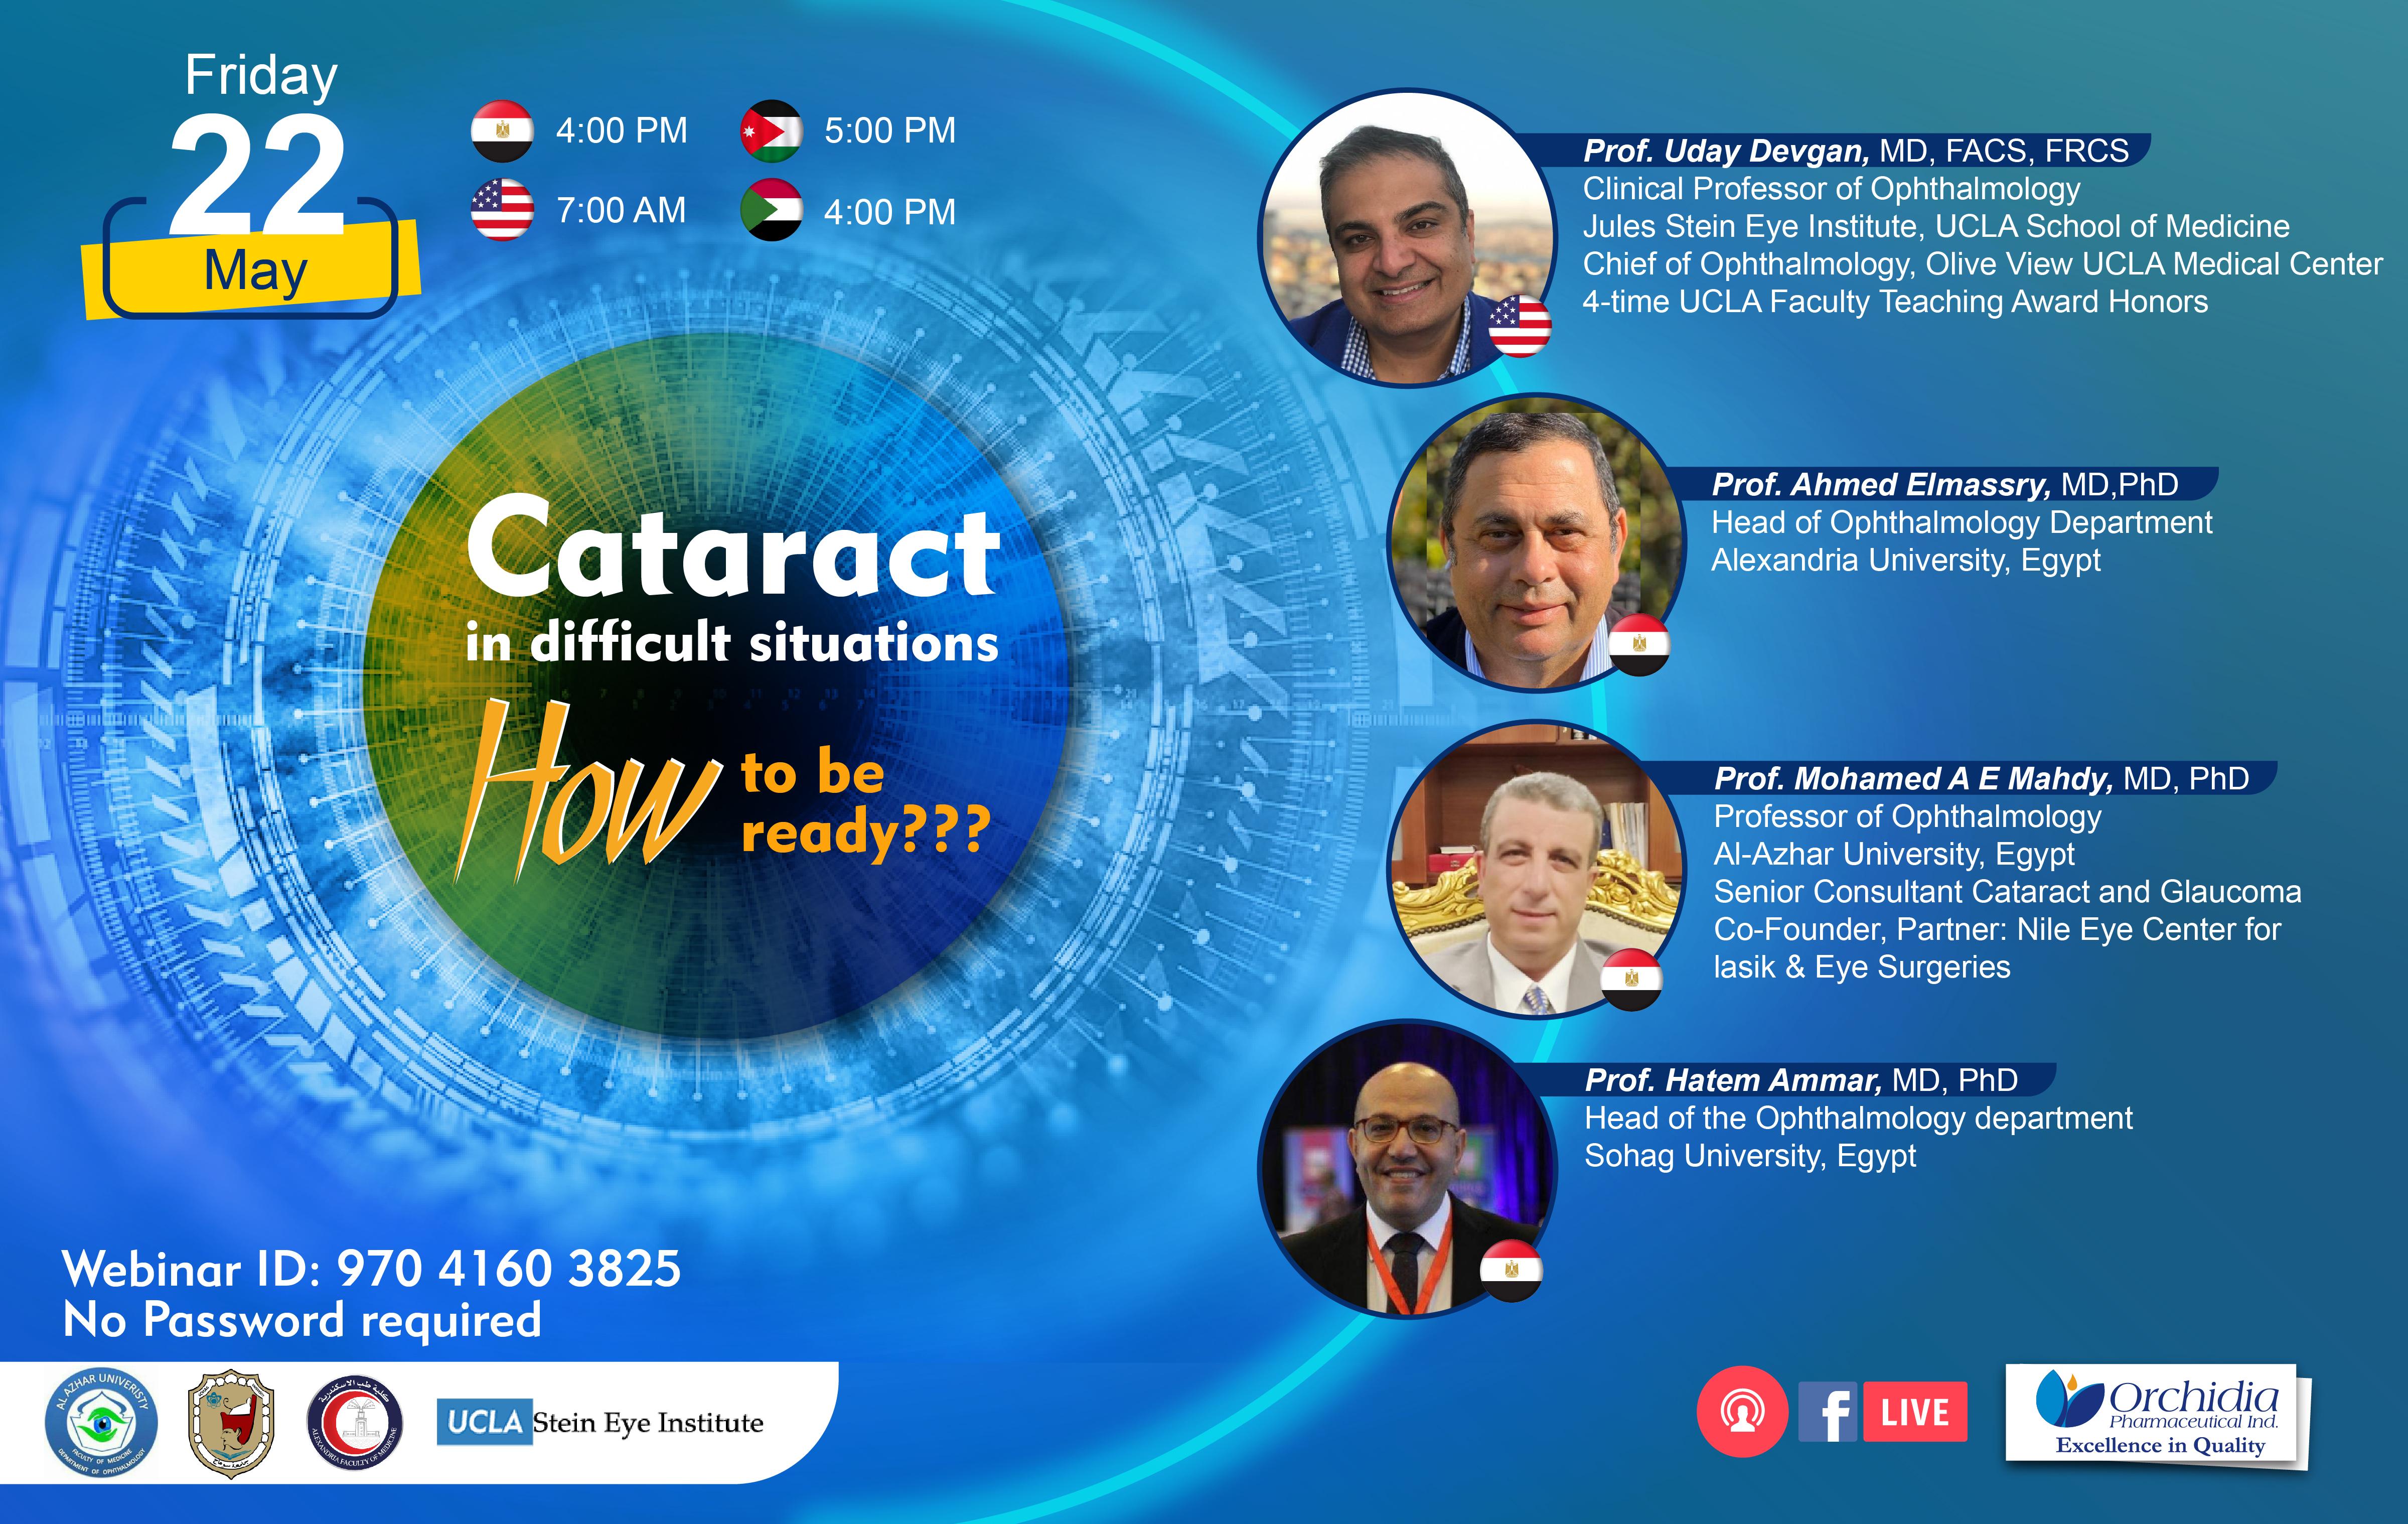 International Live Webinar invitation